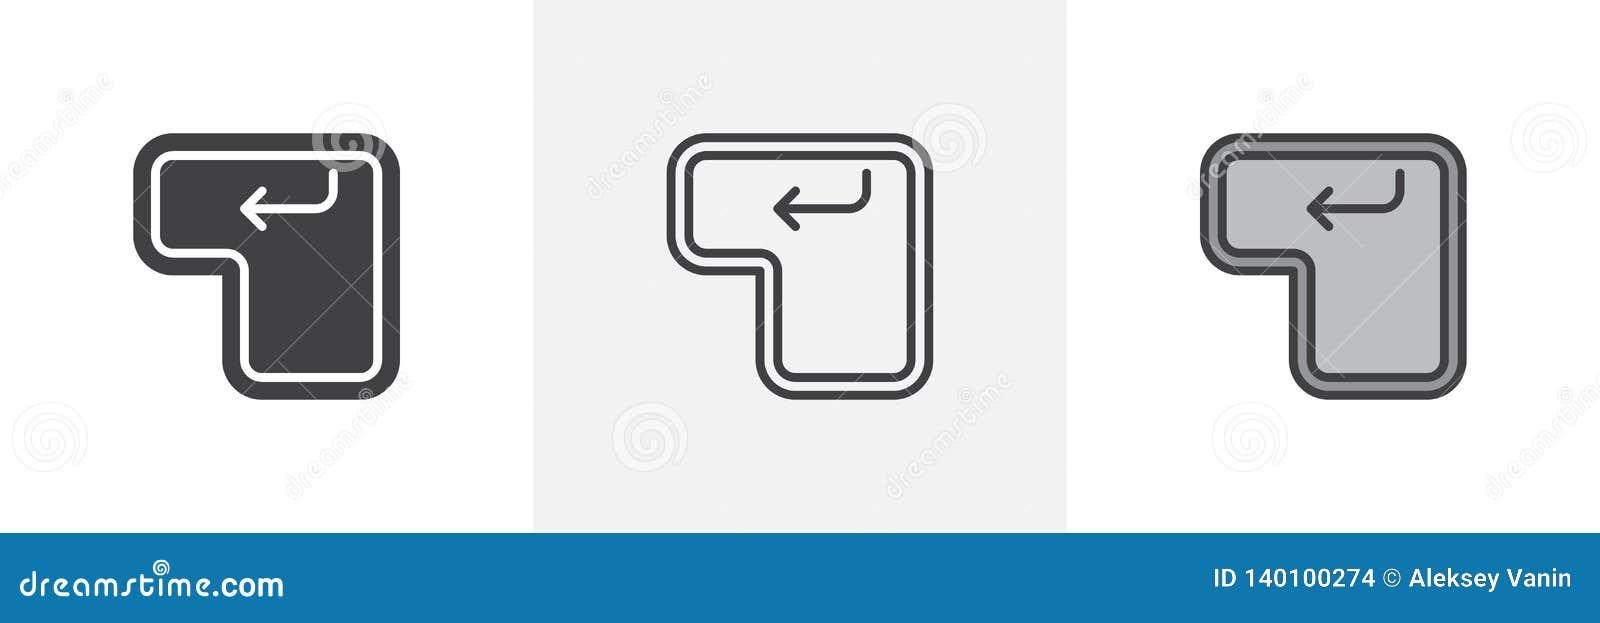 Enter key button icon stock vector  Illustration of arrow